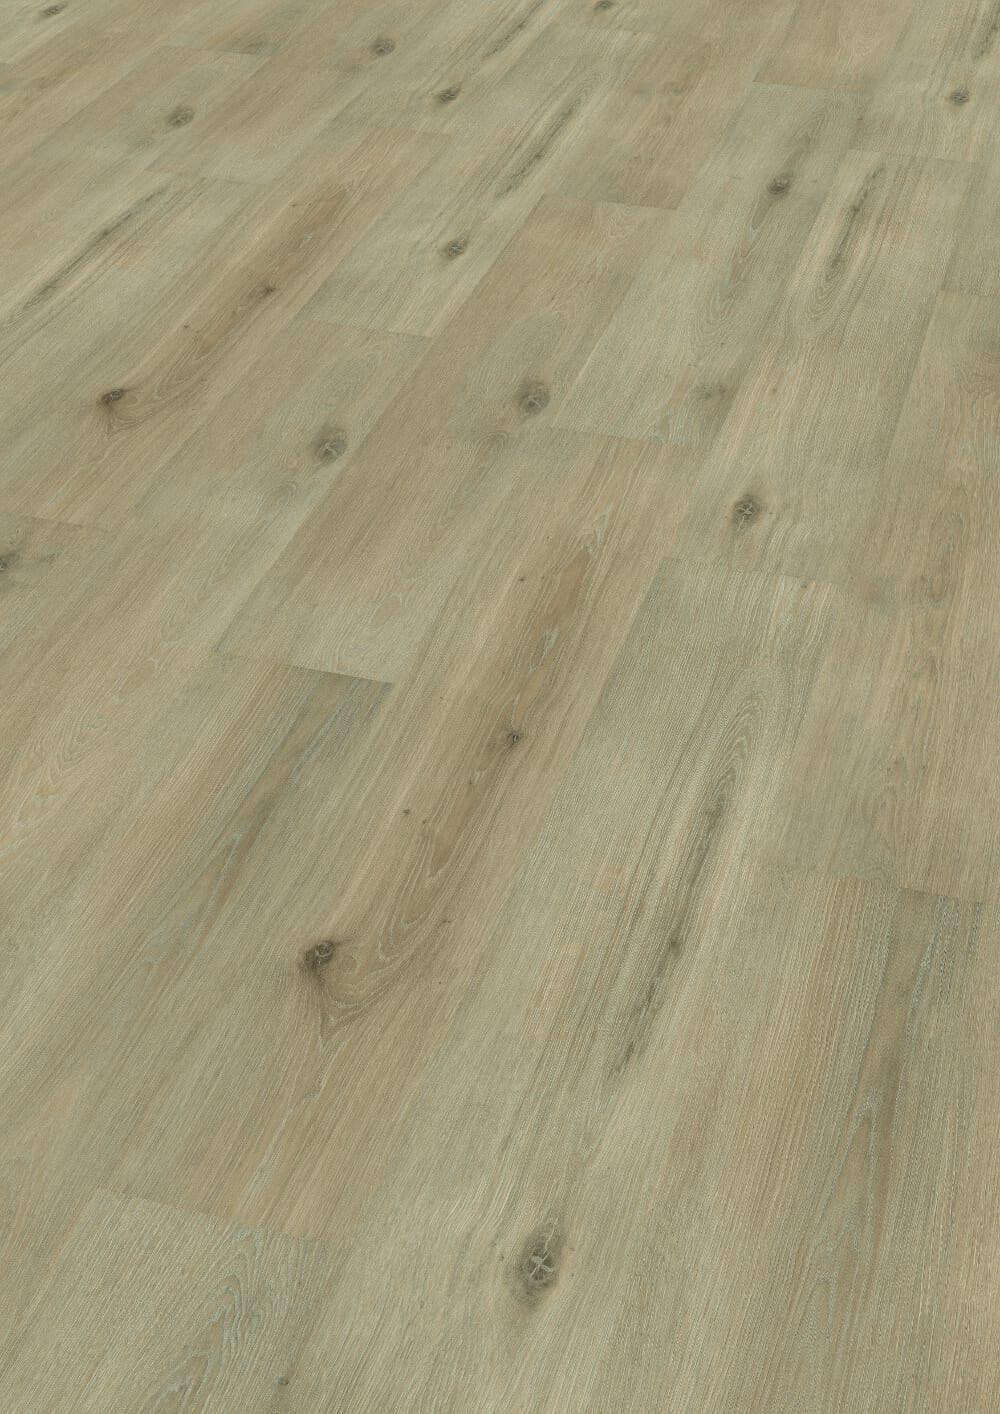 honey oak hardwood flooring sale of 36 awesome honey oak flooring images flooring design ideas intended for honey oak flooring new island oak sand wineo purline 1000 wood klick design planke image of